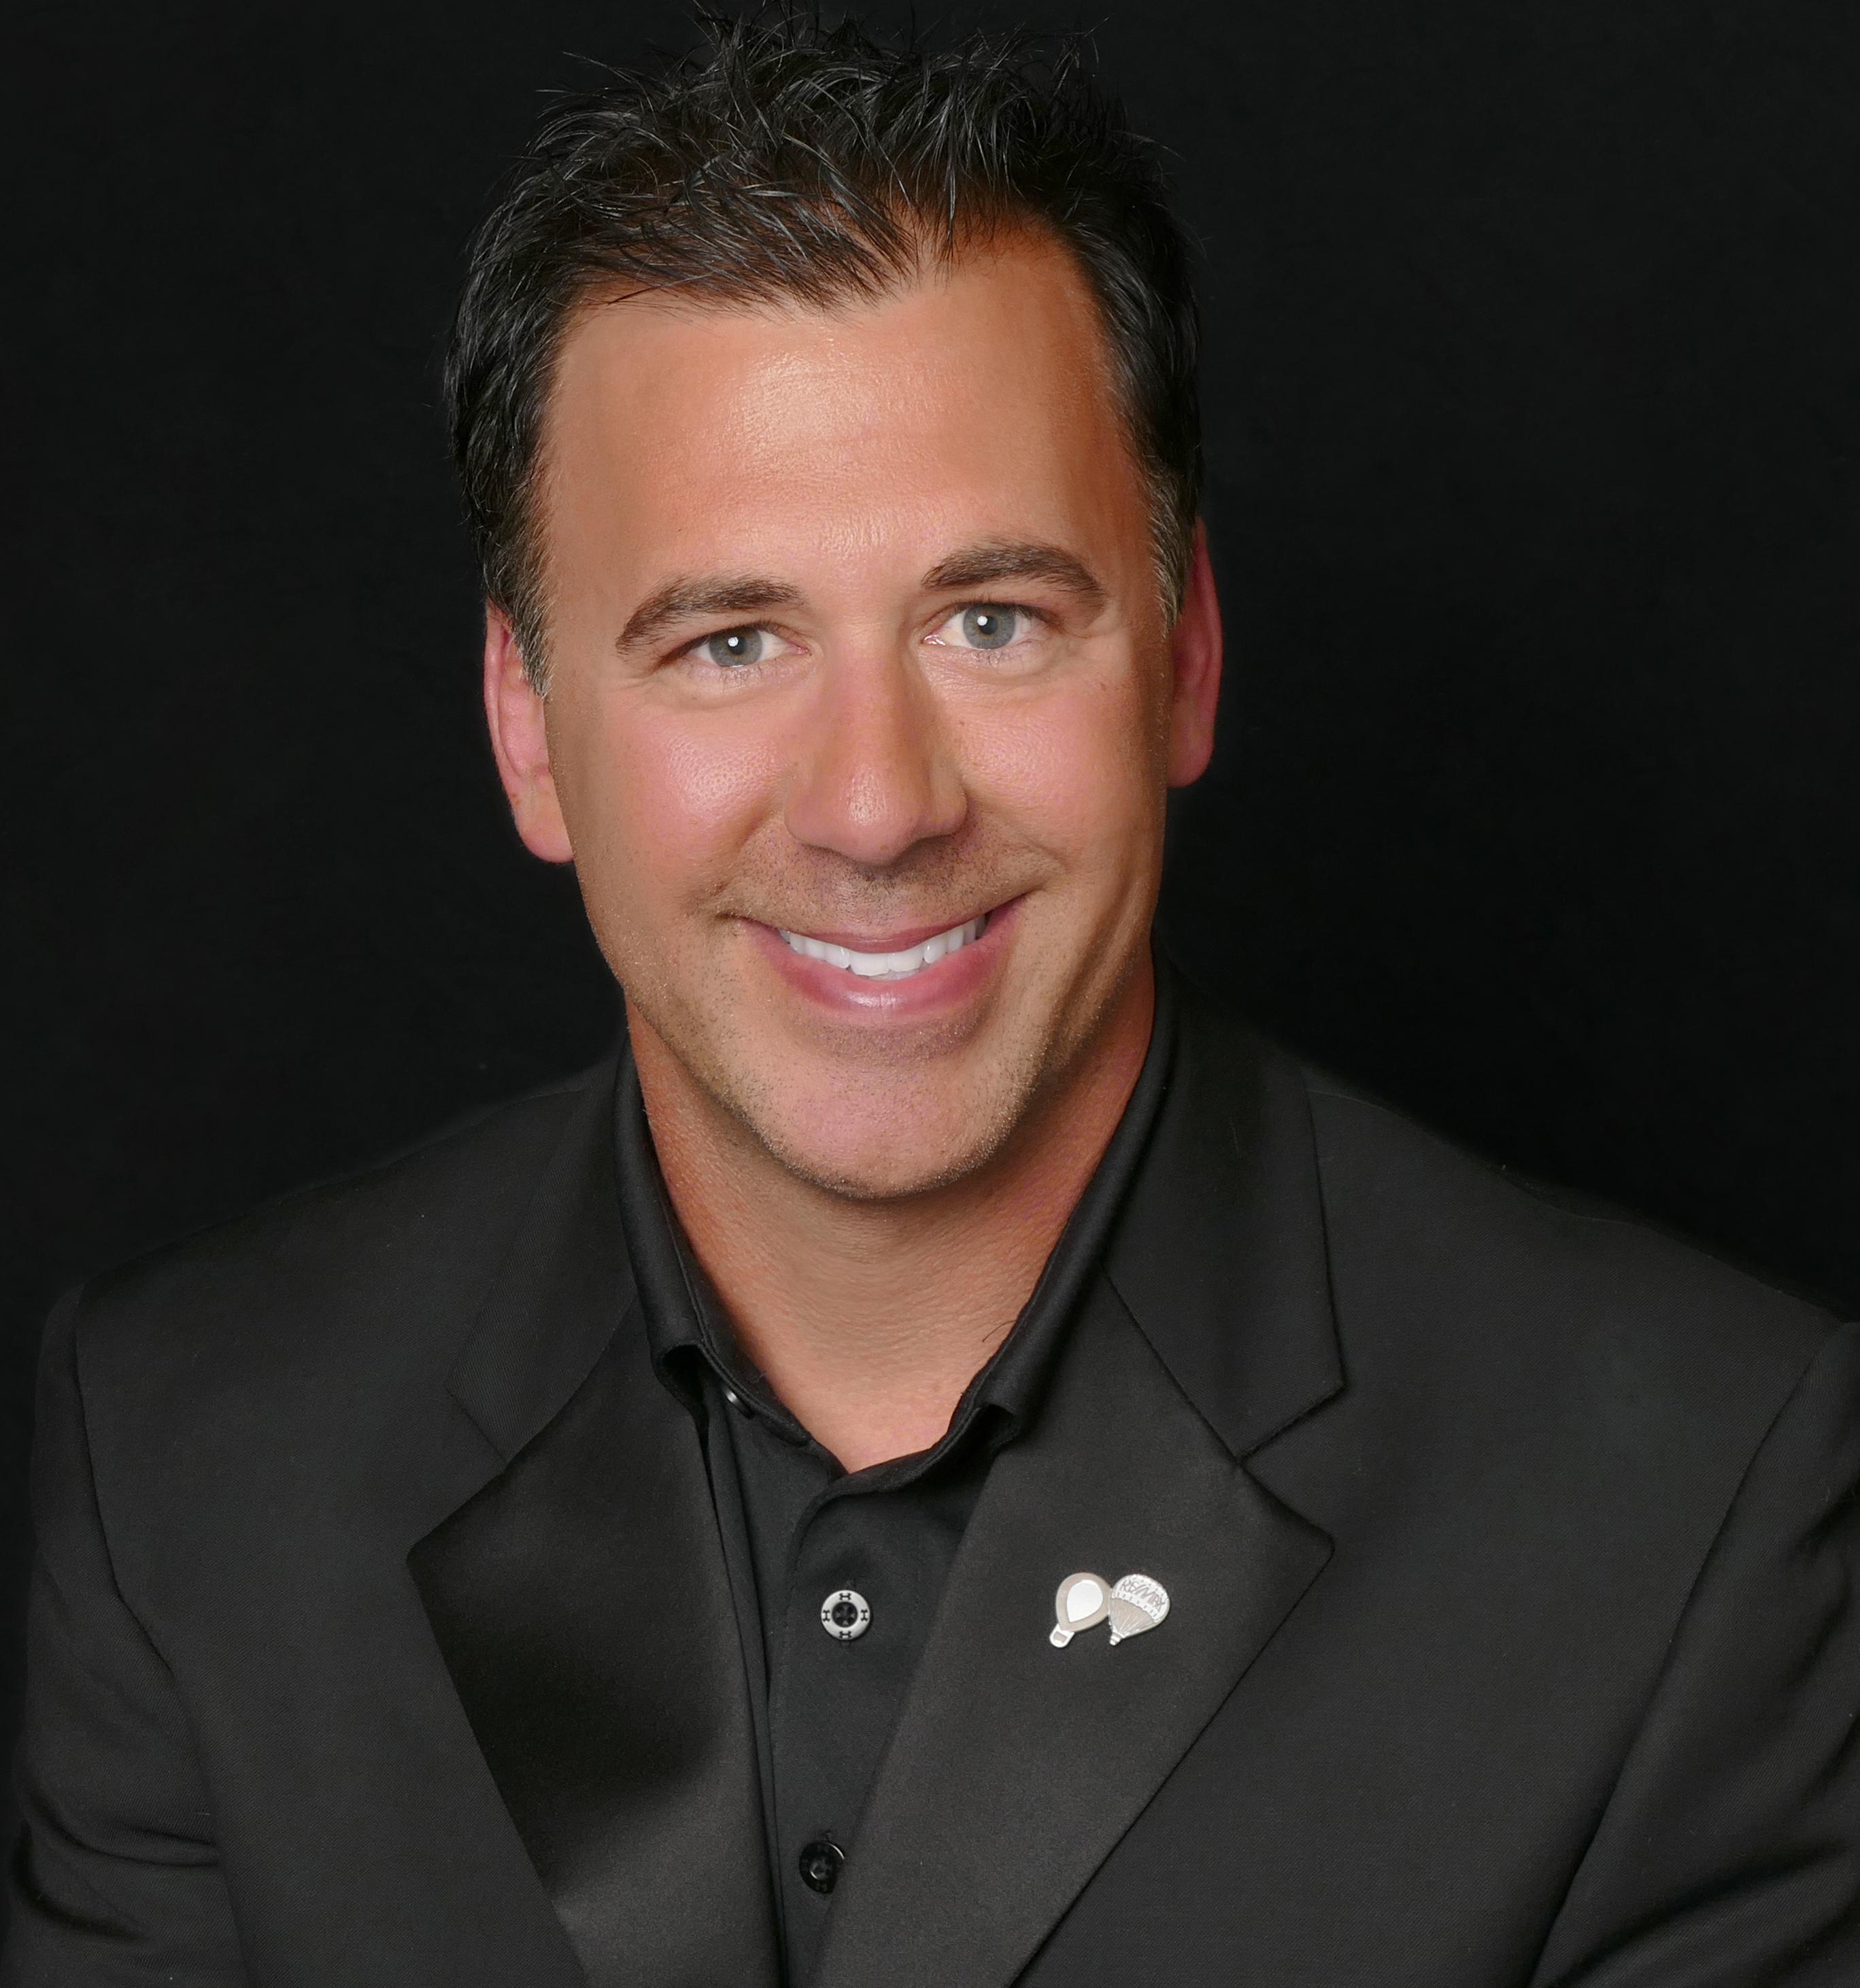 Dave J. Kaercher